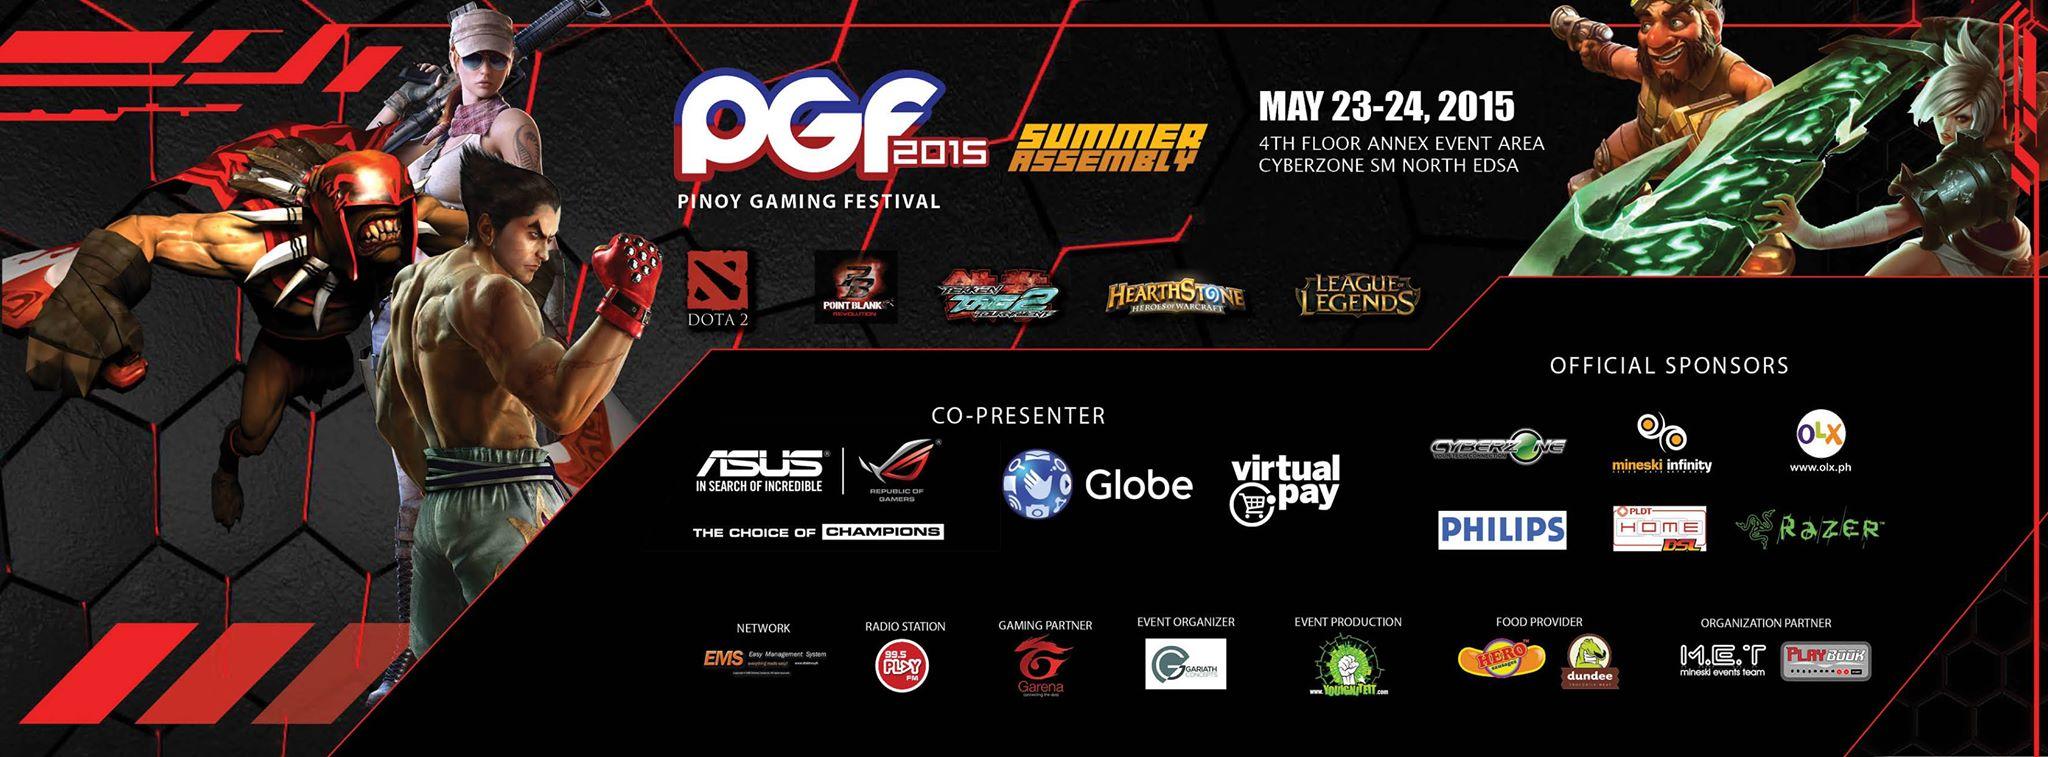 PGF-Summer-Assembly-PR-Images (3)